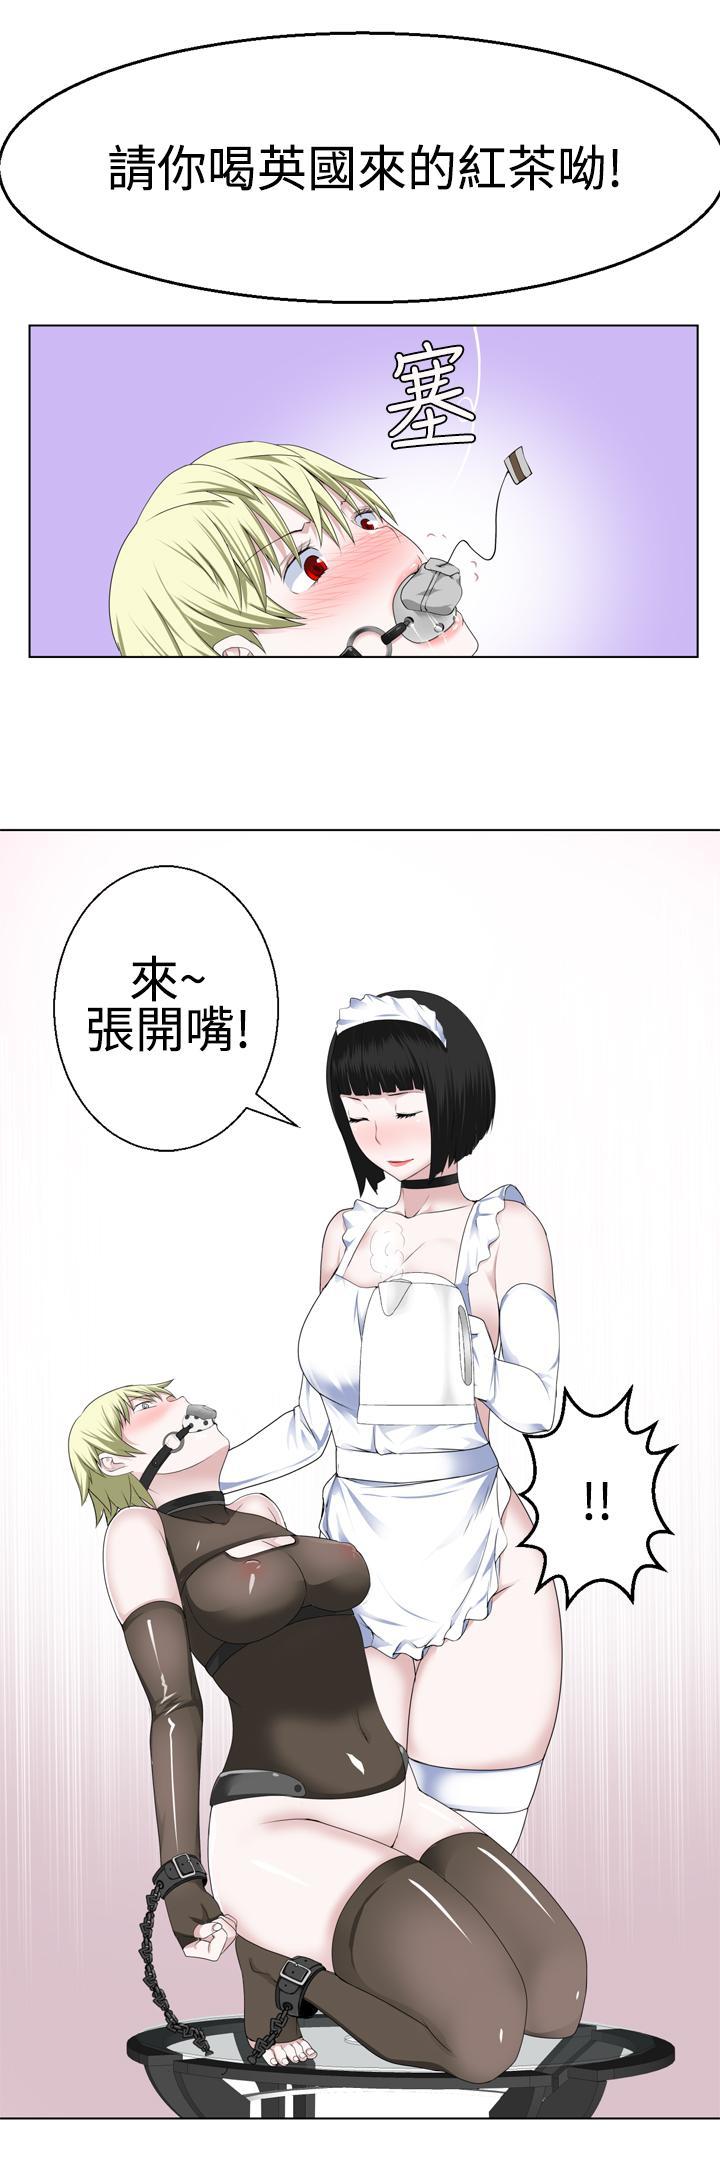 [SOSO] Franken Jo 为爱而生 法兰克赵 Ch.1~19 [Chinese]中文 324